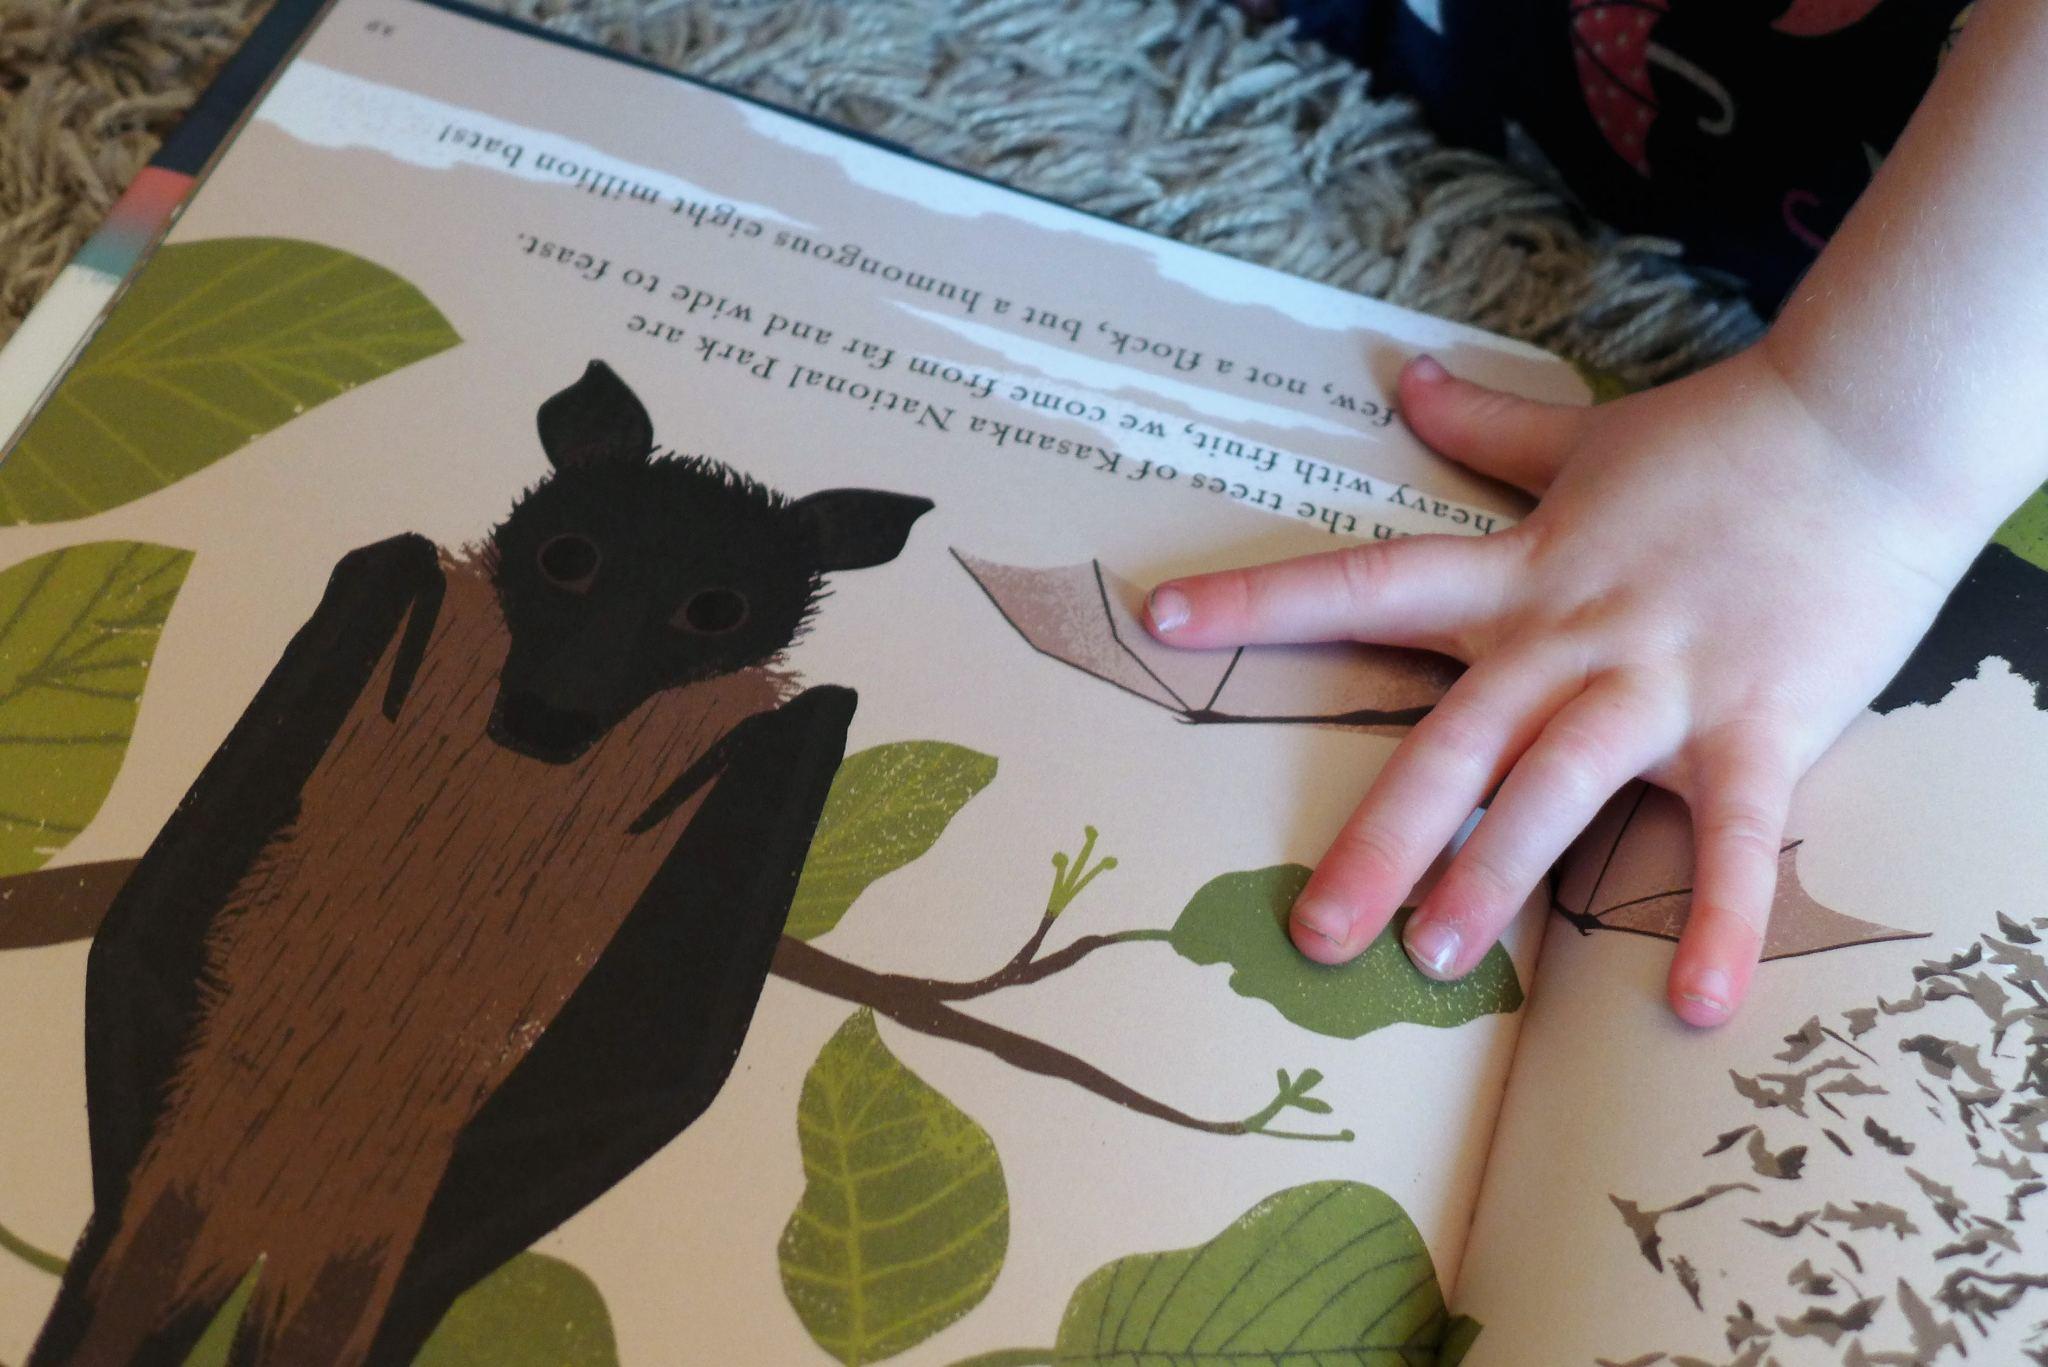 we travel so far migration book for children